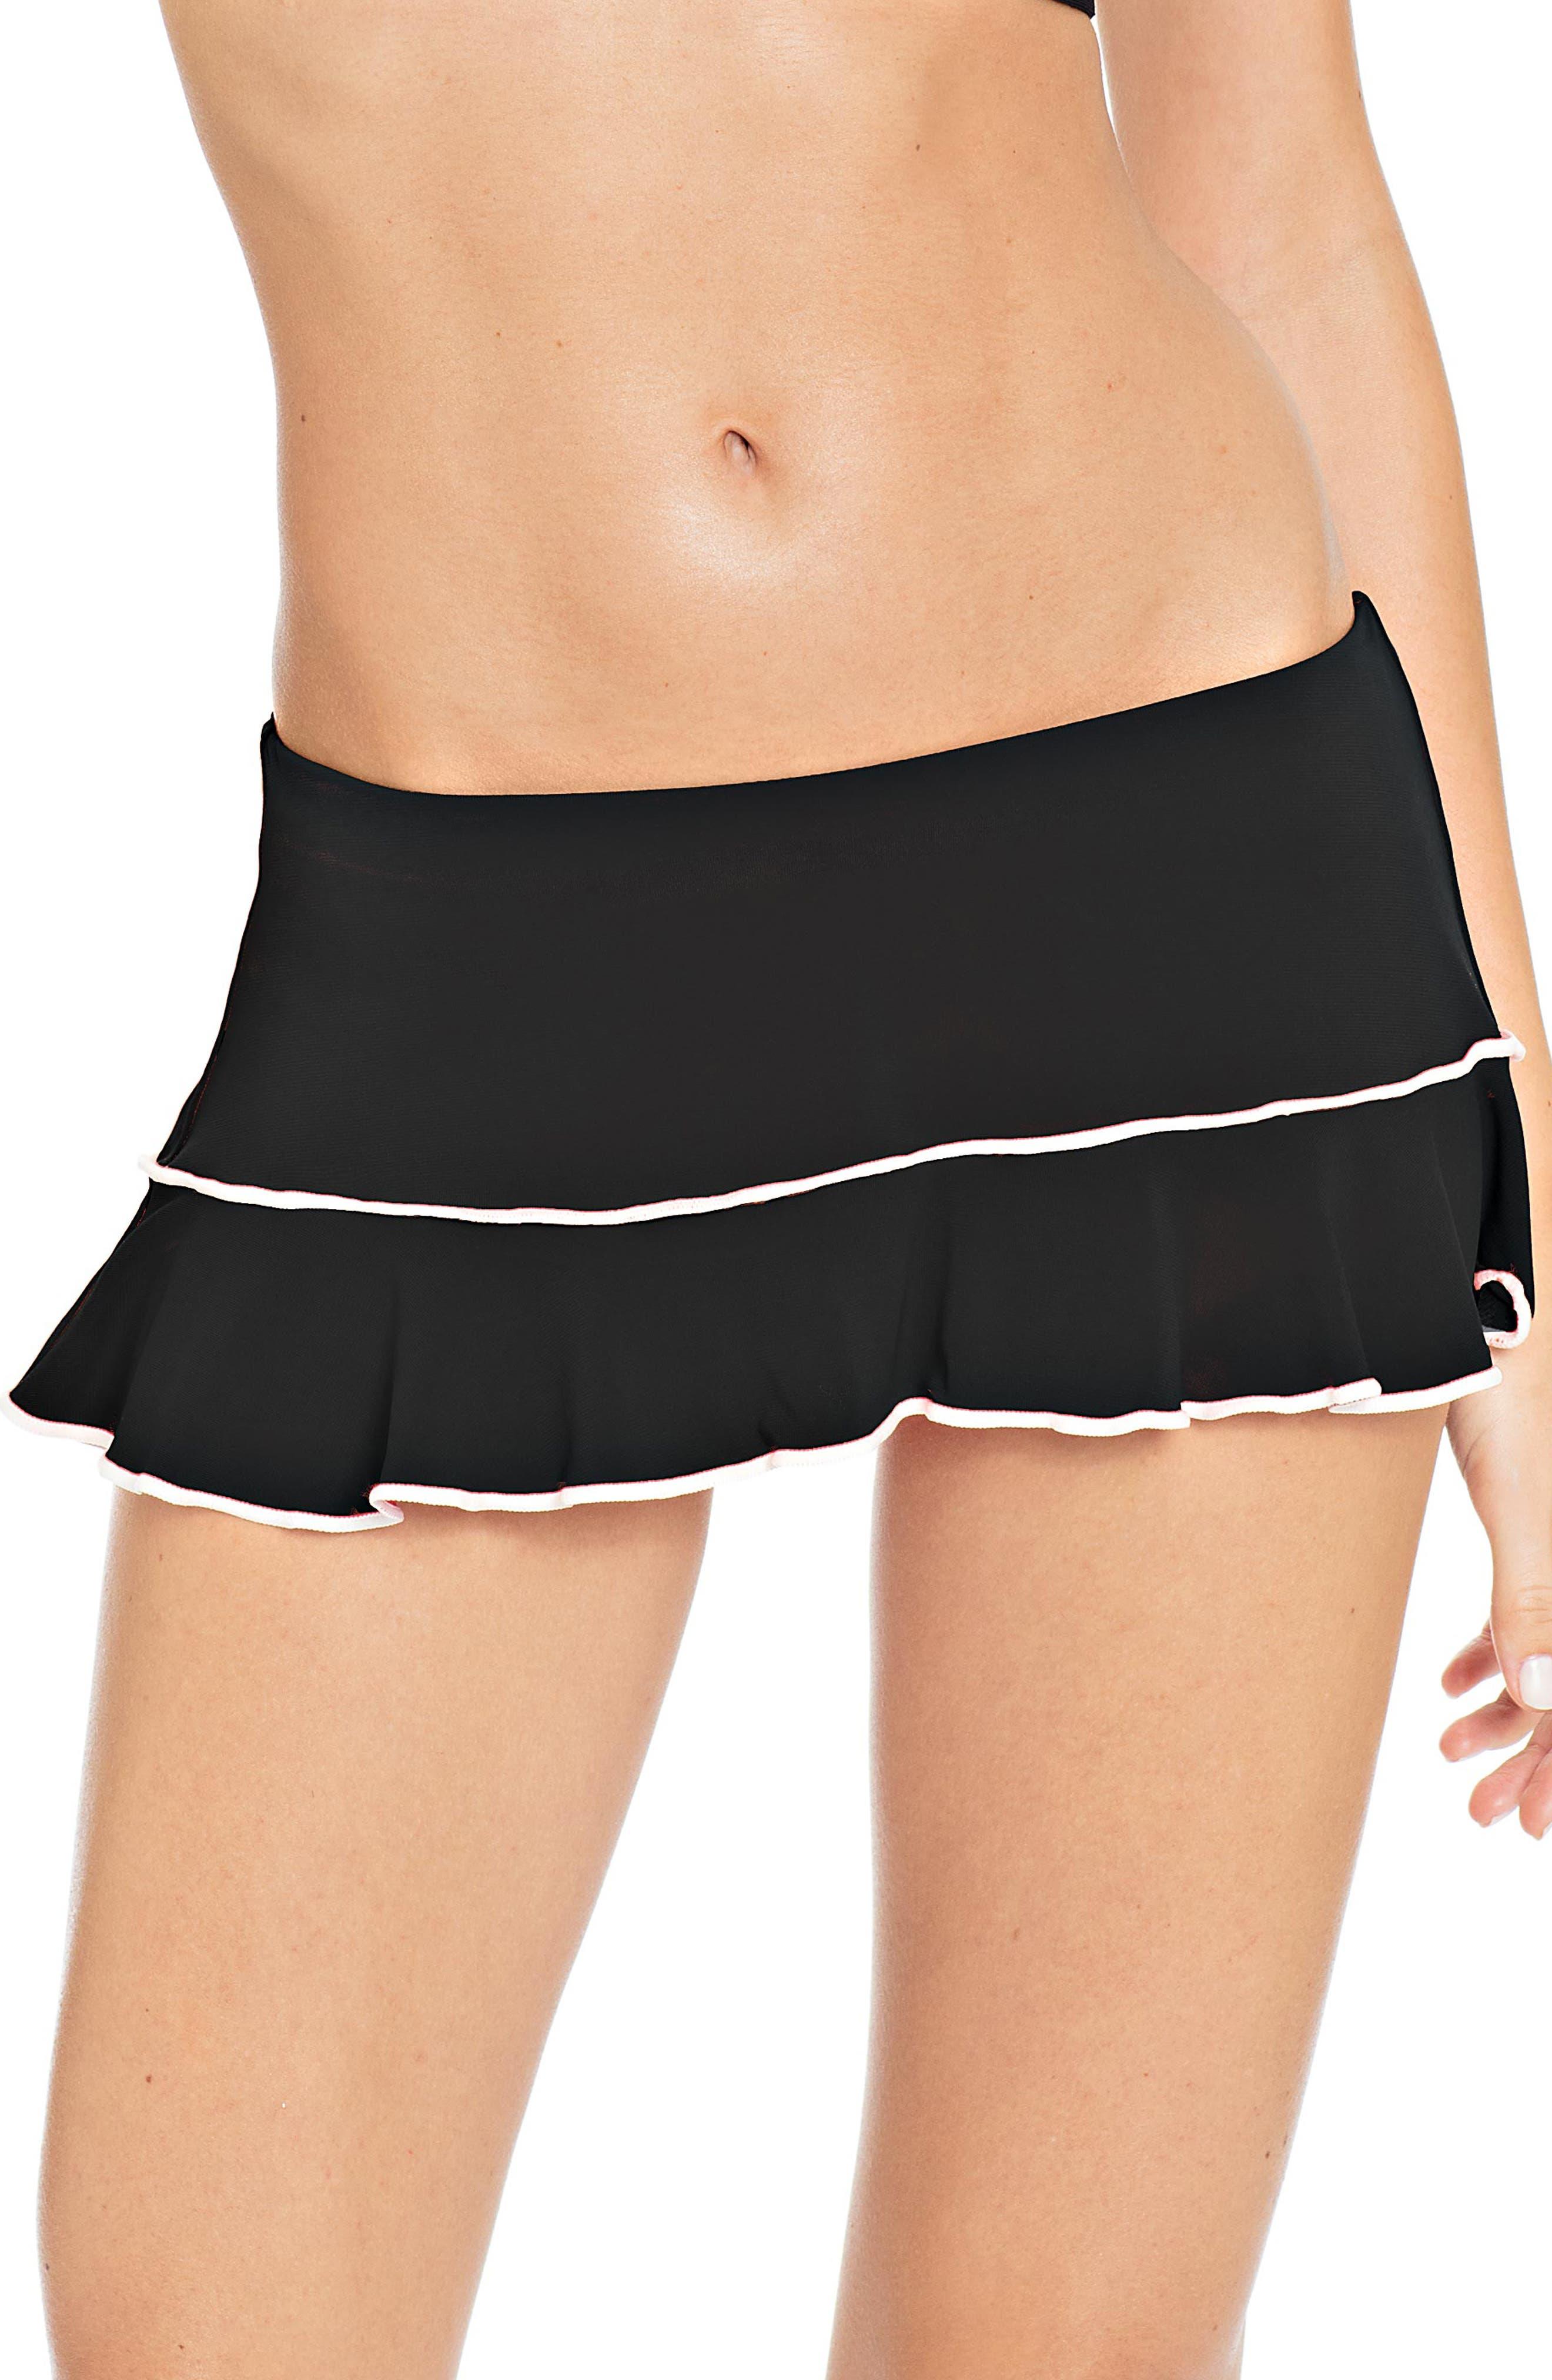 Malia Skirted Bikini Bottoms,                             Main thumbnail 1, color,                             BLACK/ WHITE